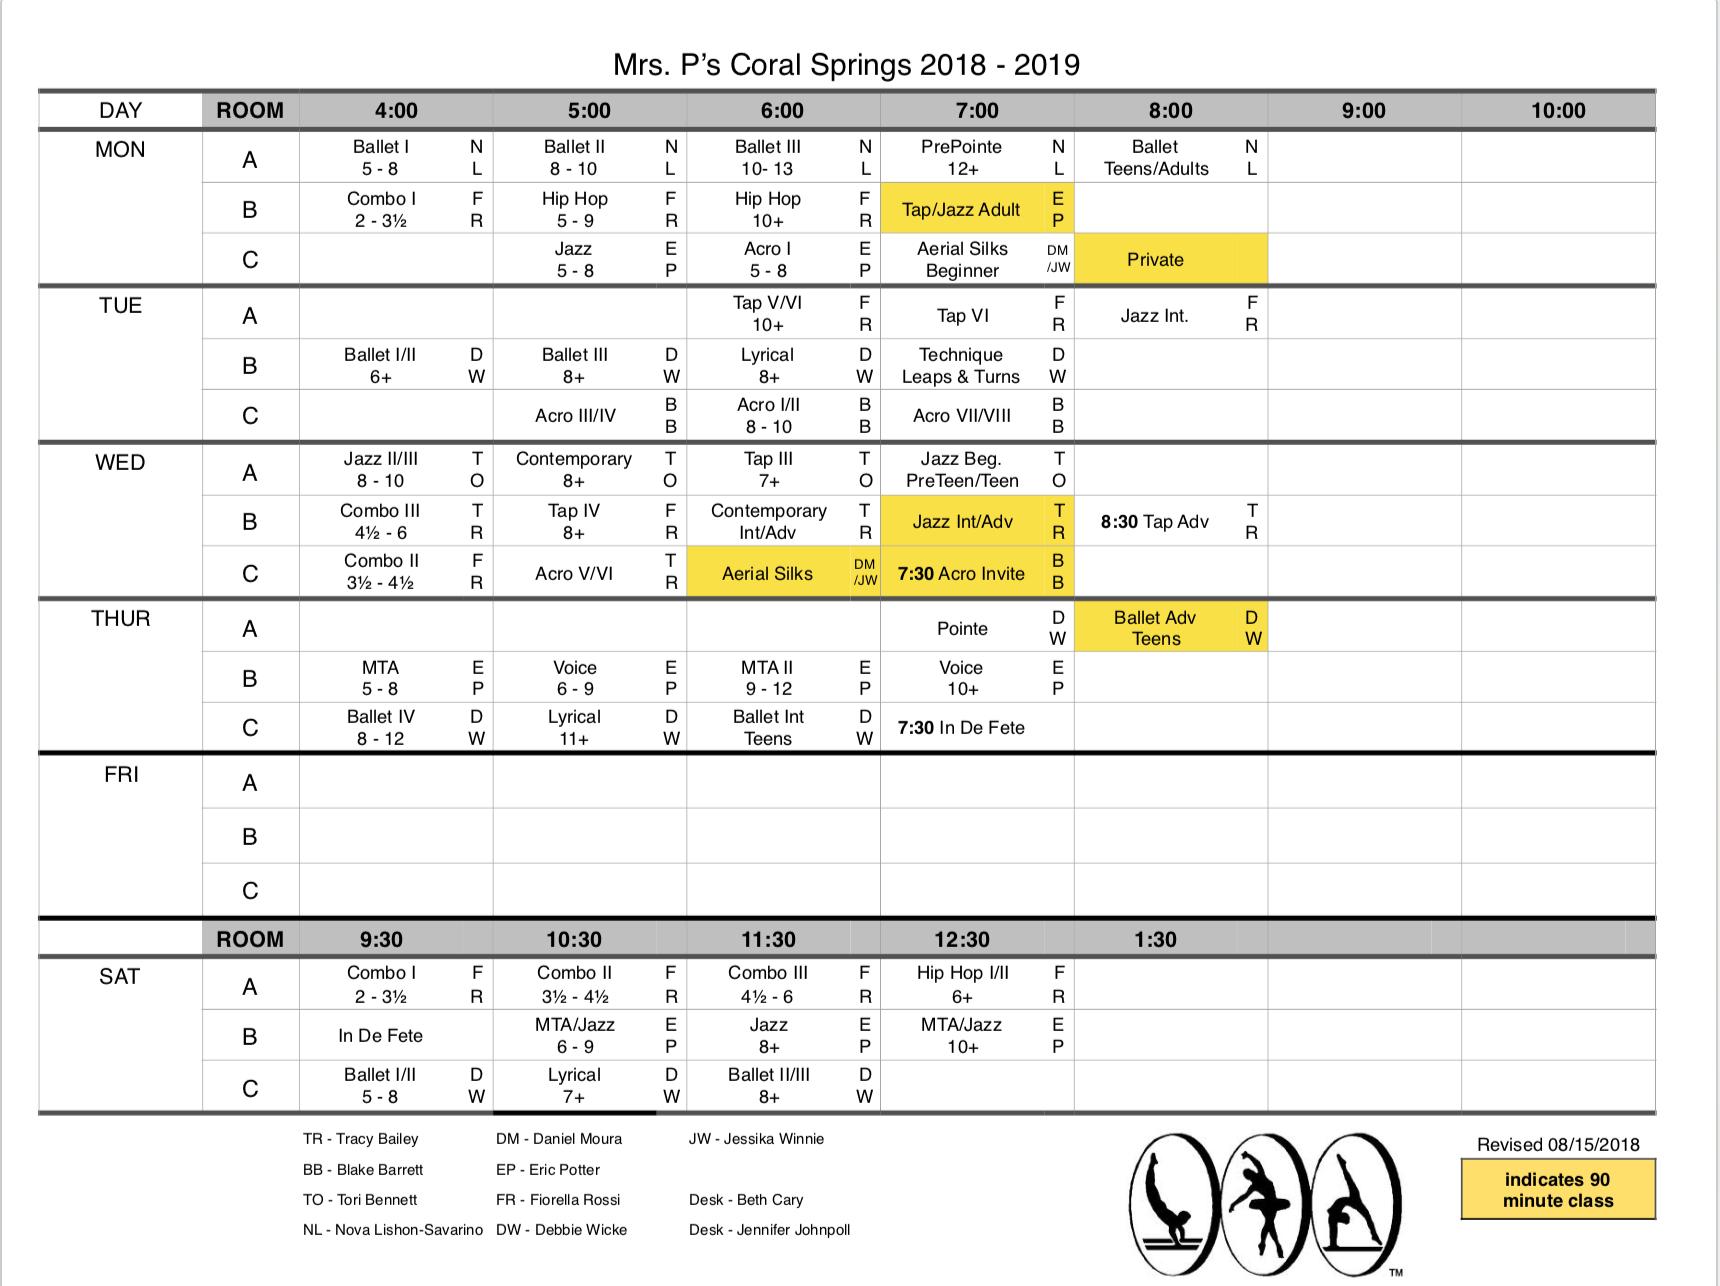 2018 - 2019 Schedule Updated 08/15/2018